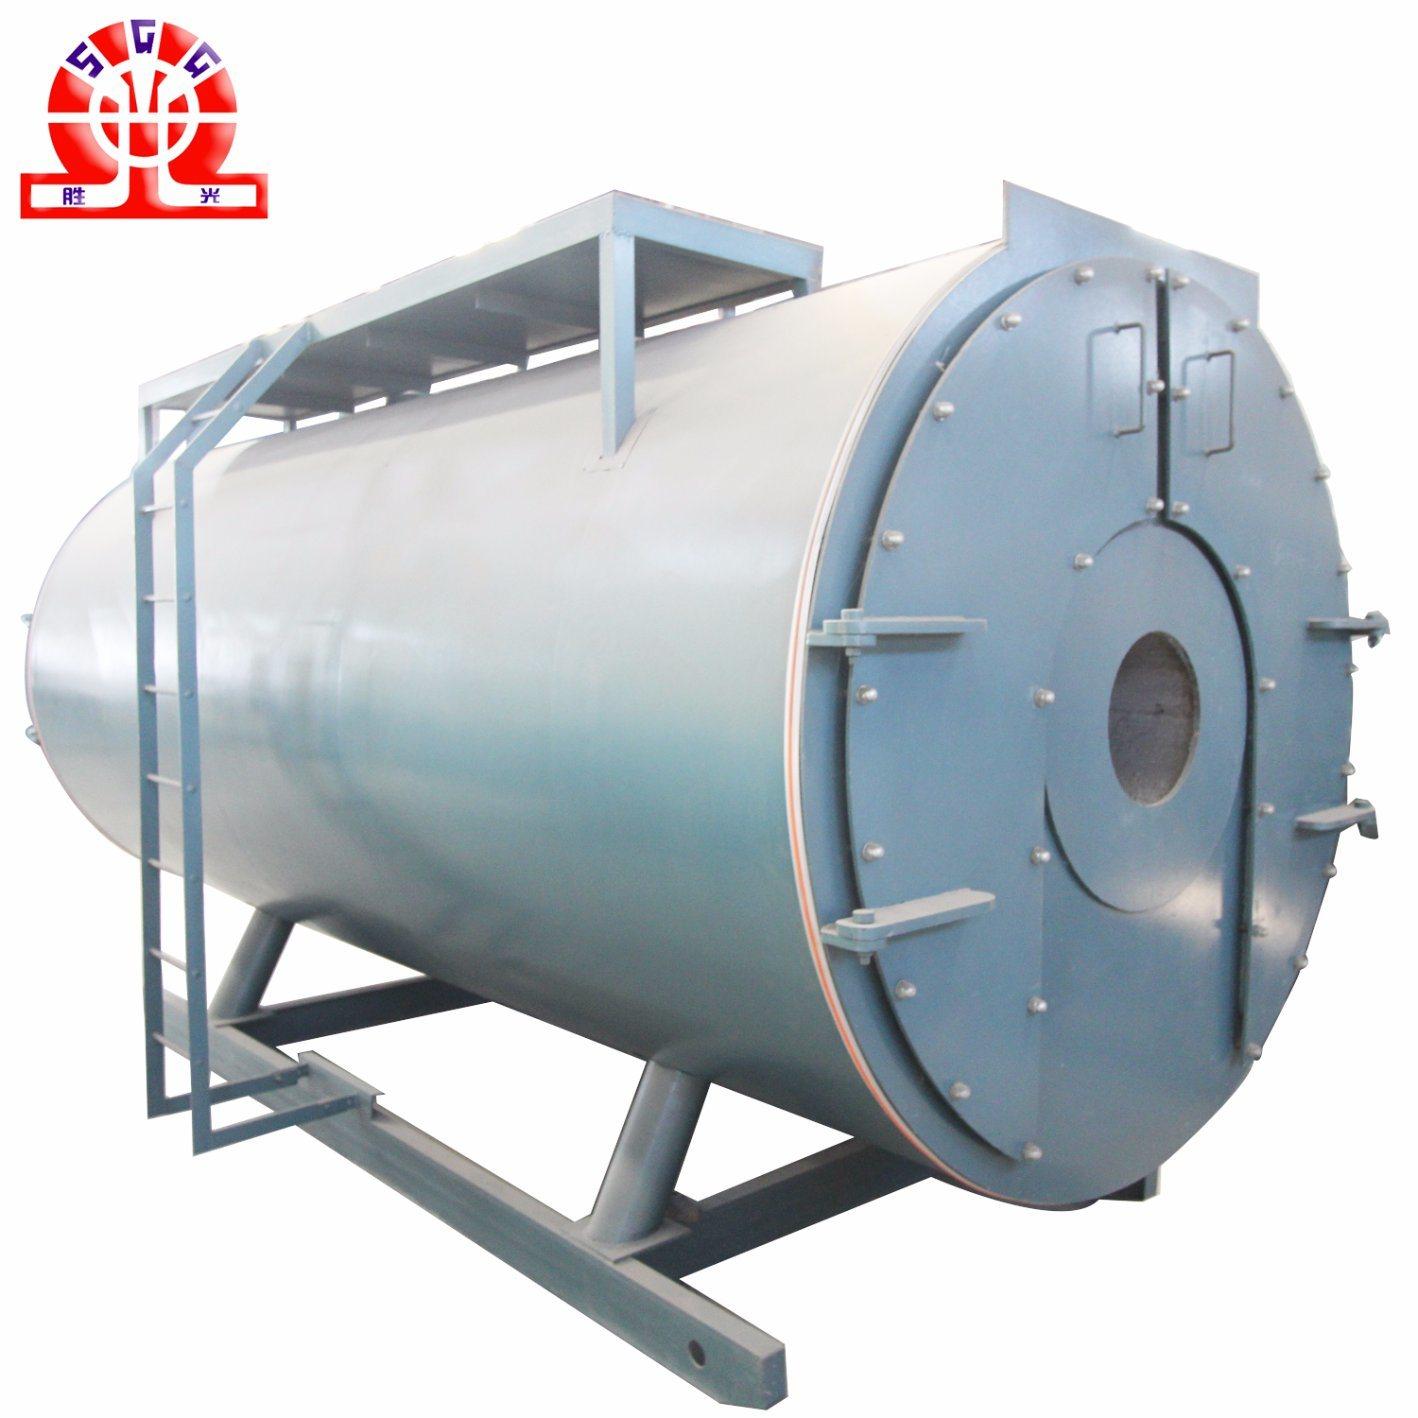 China 3 Pass Dual Fuel Horizontal Steam Boiler - China Stainless ...